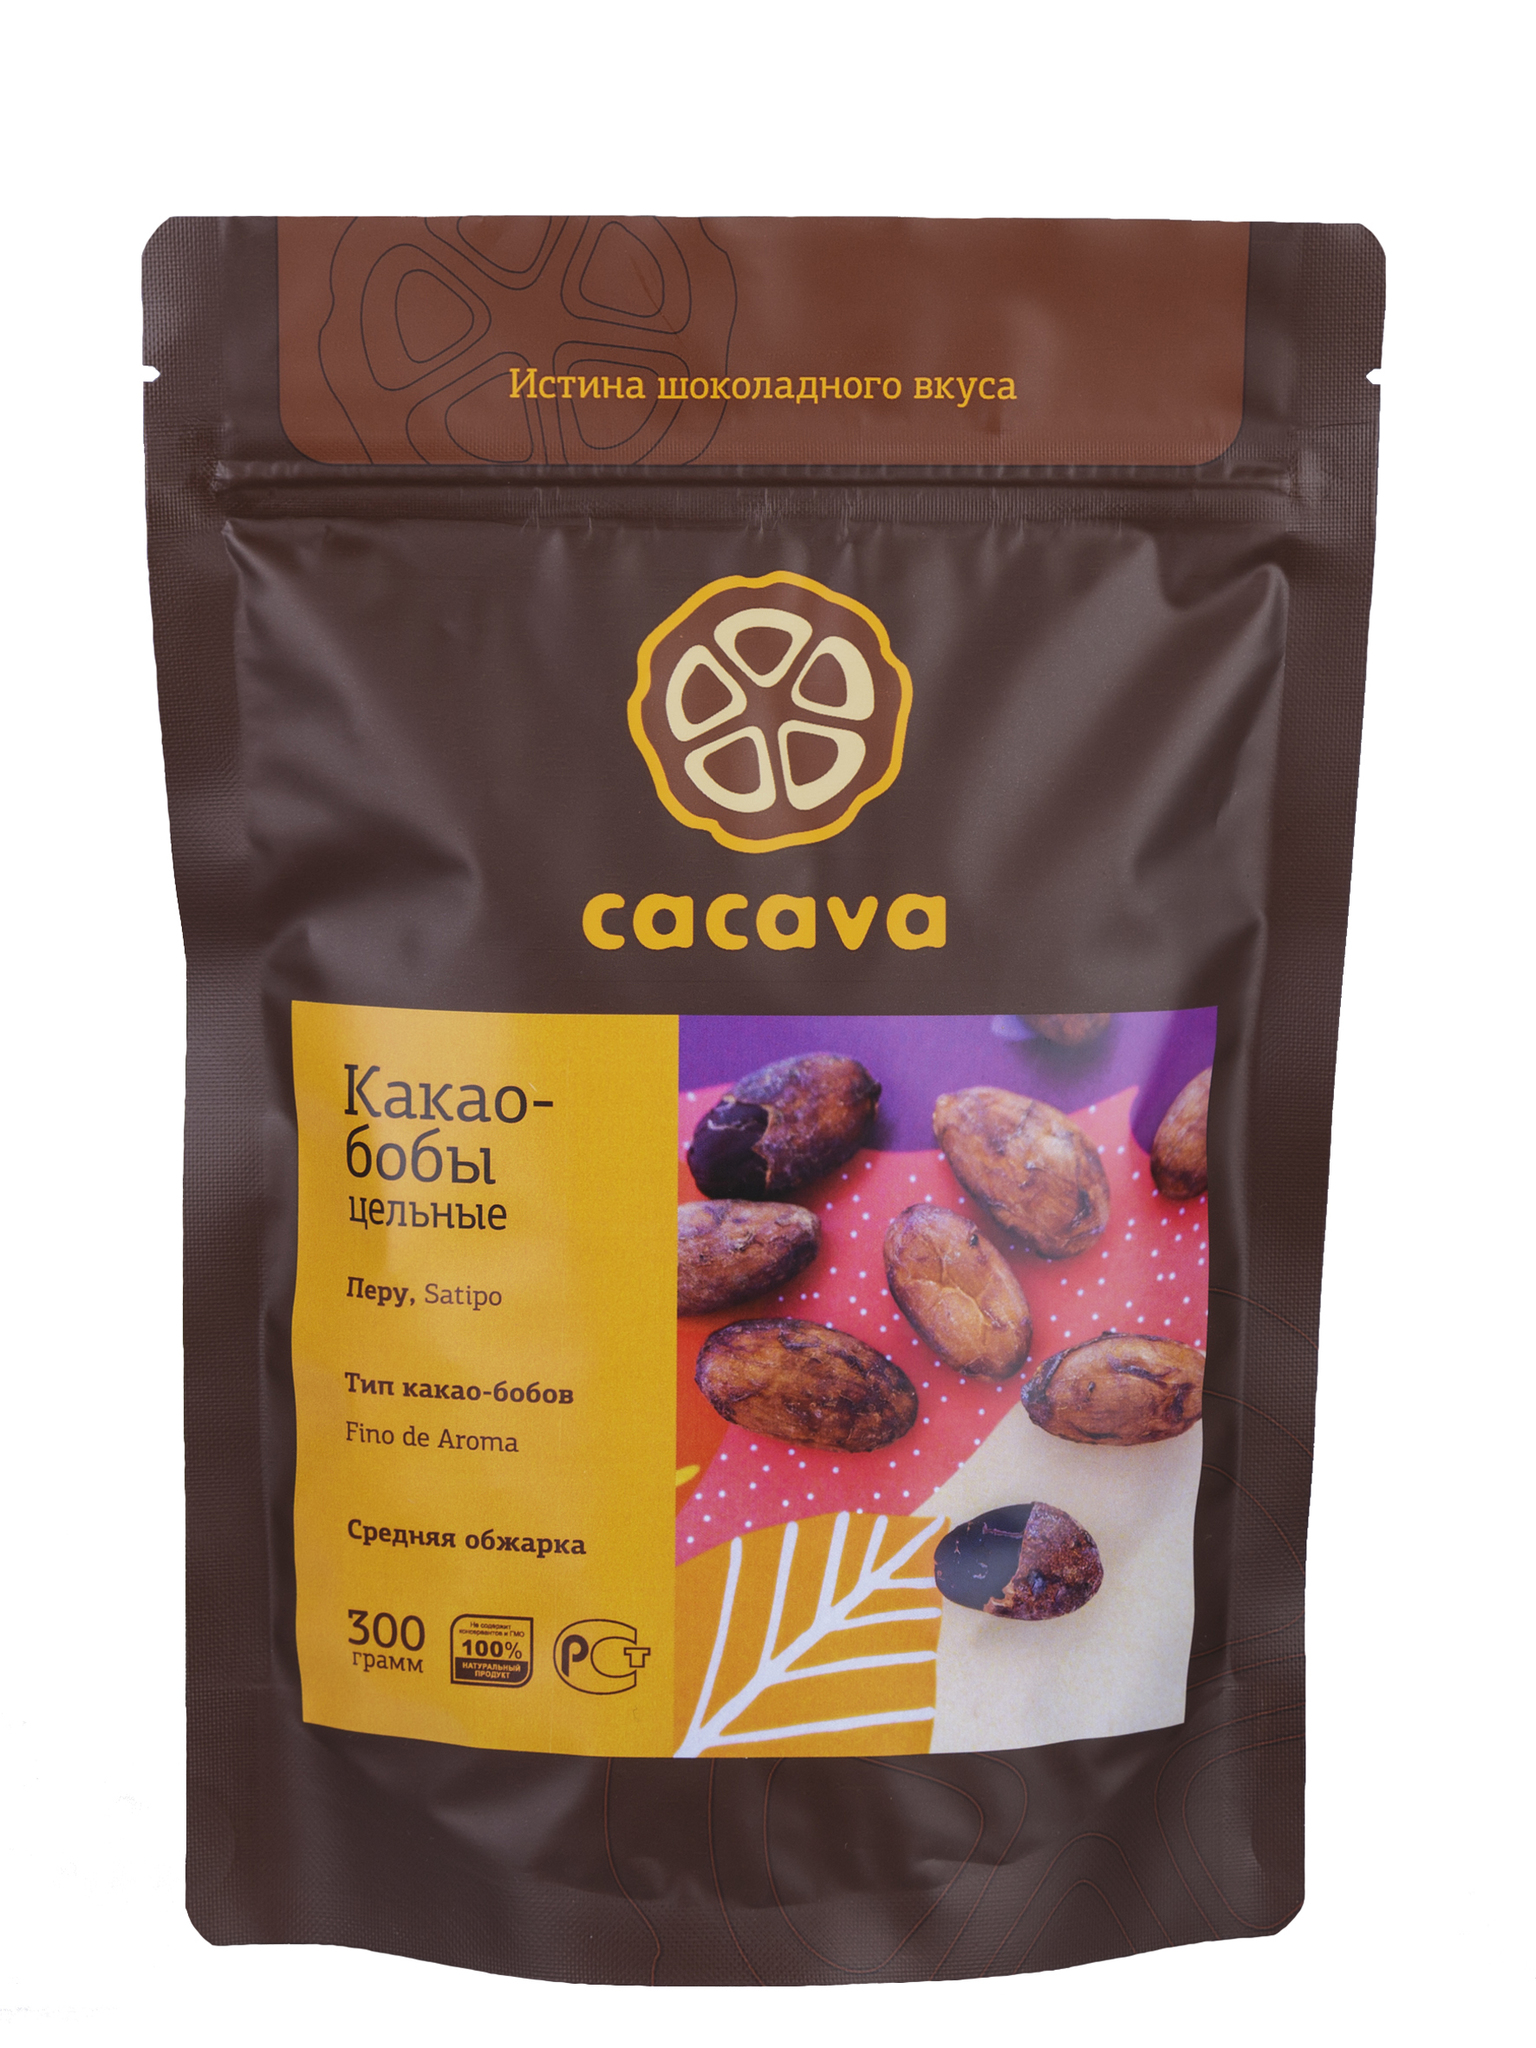 Какао-бобы цельные (Перу), упаковка 300 грамм